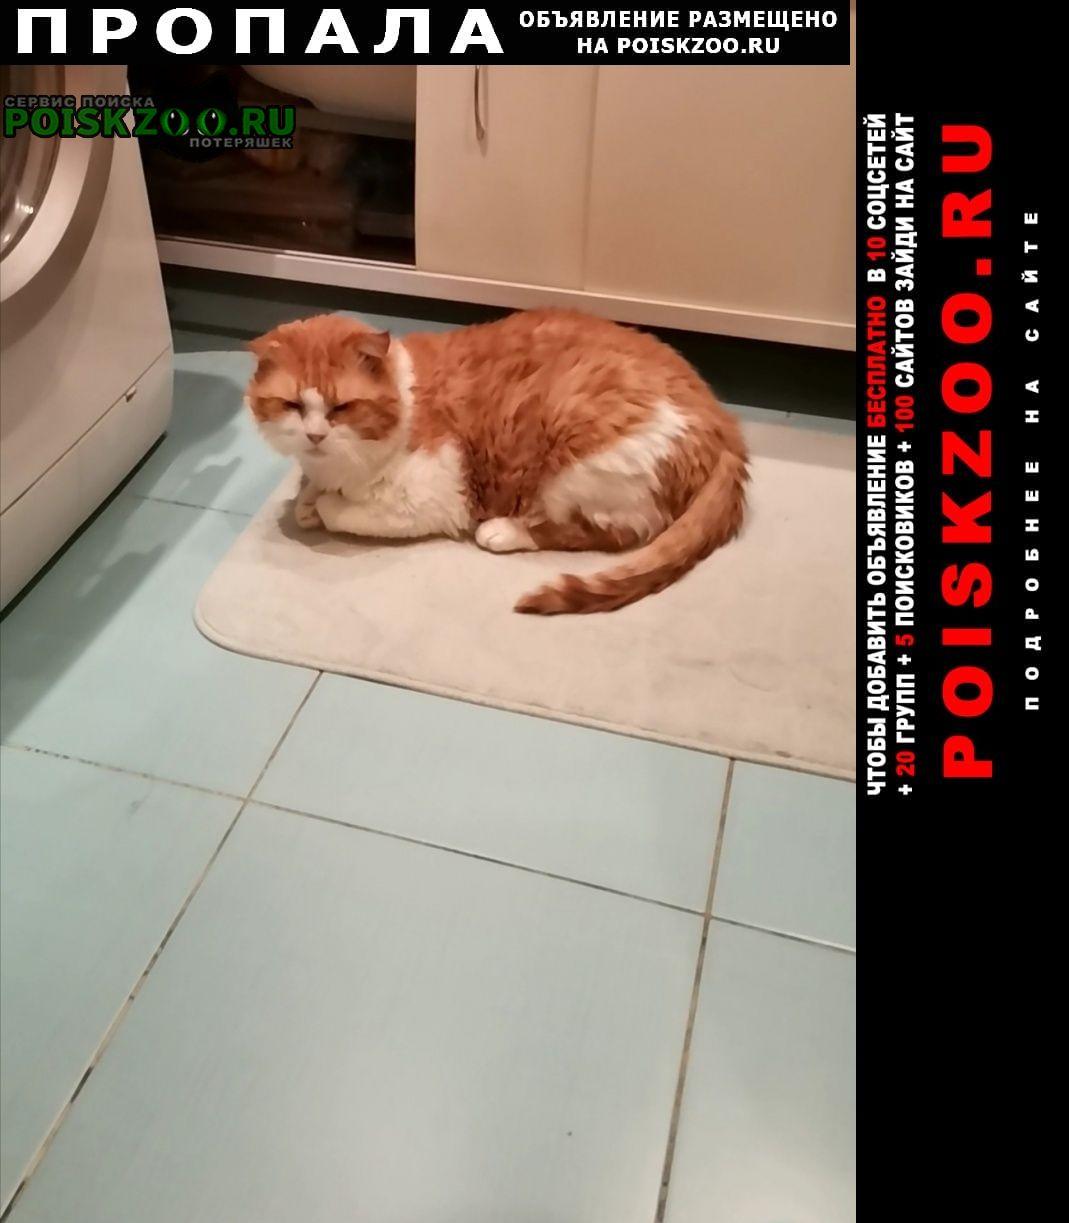 Санкт-Петербург Пропал кот 10 летний семьи